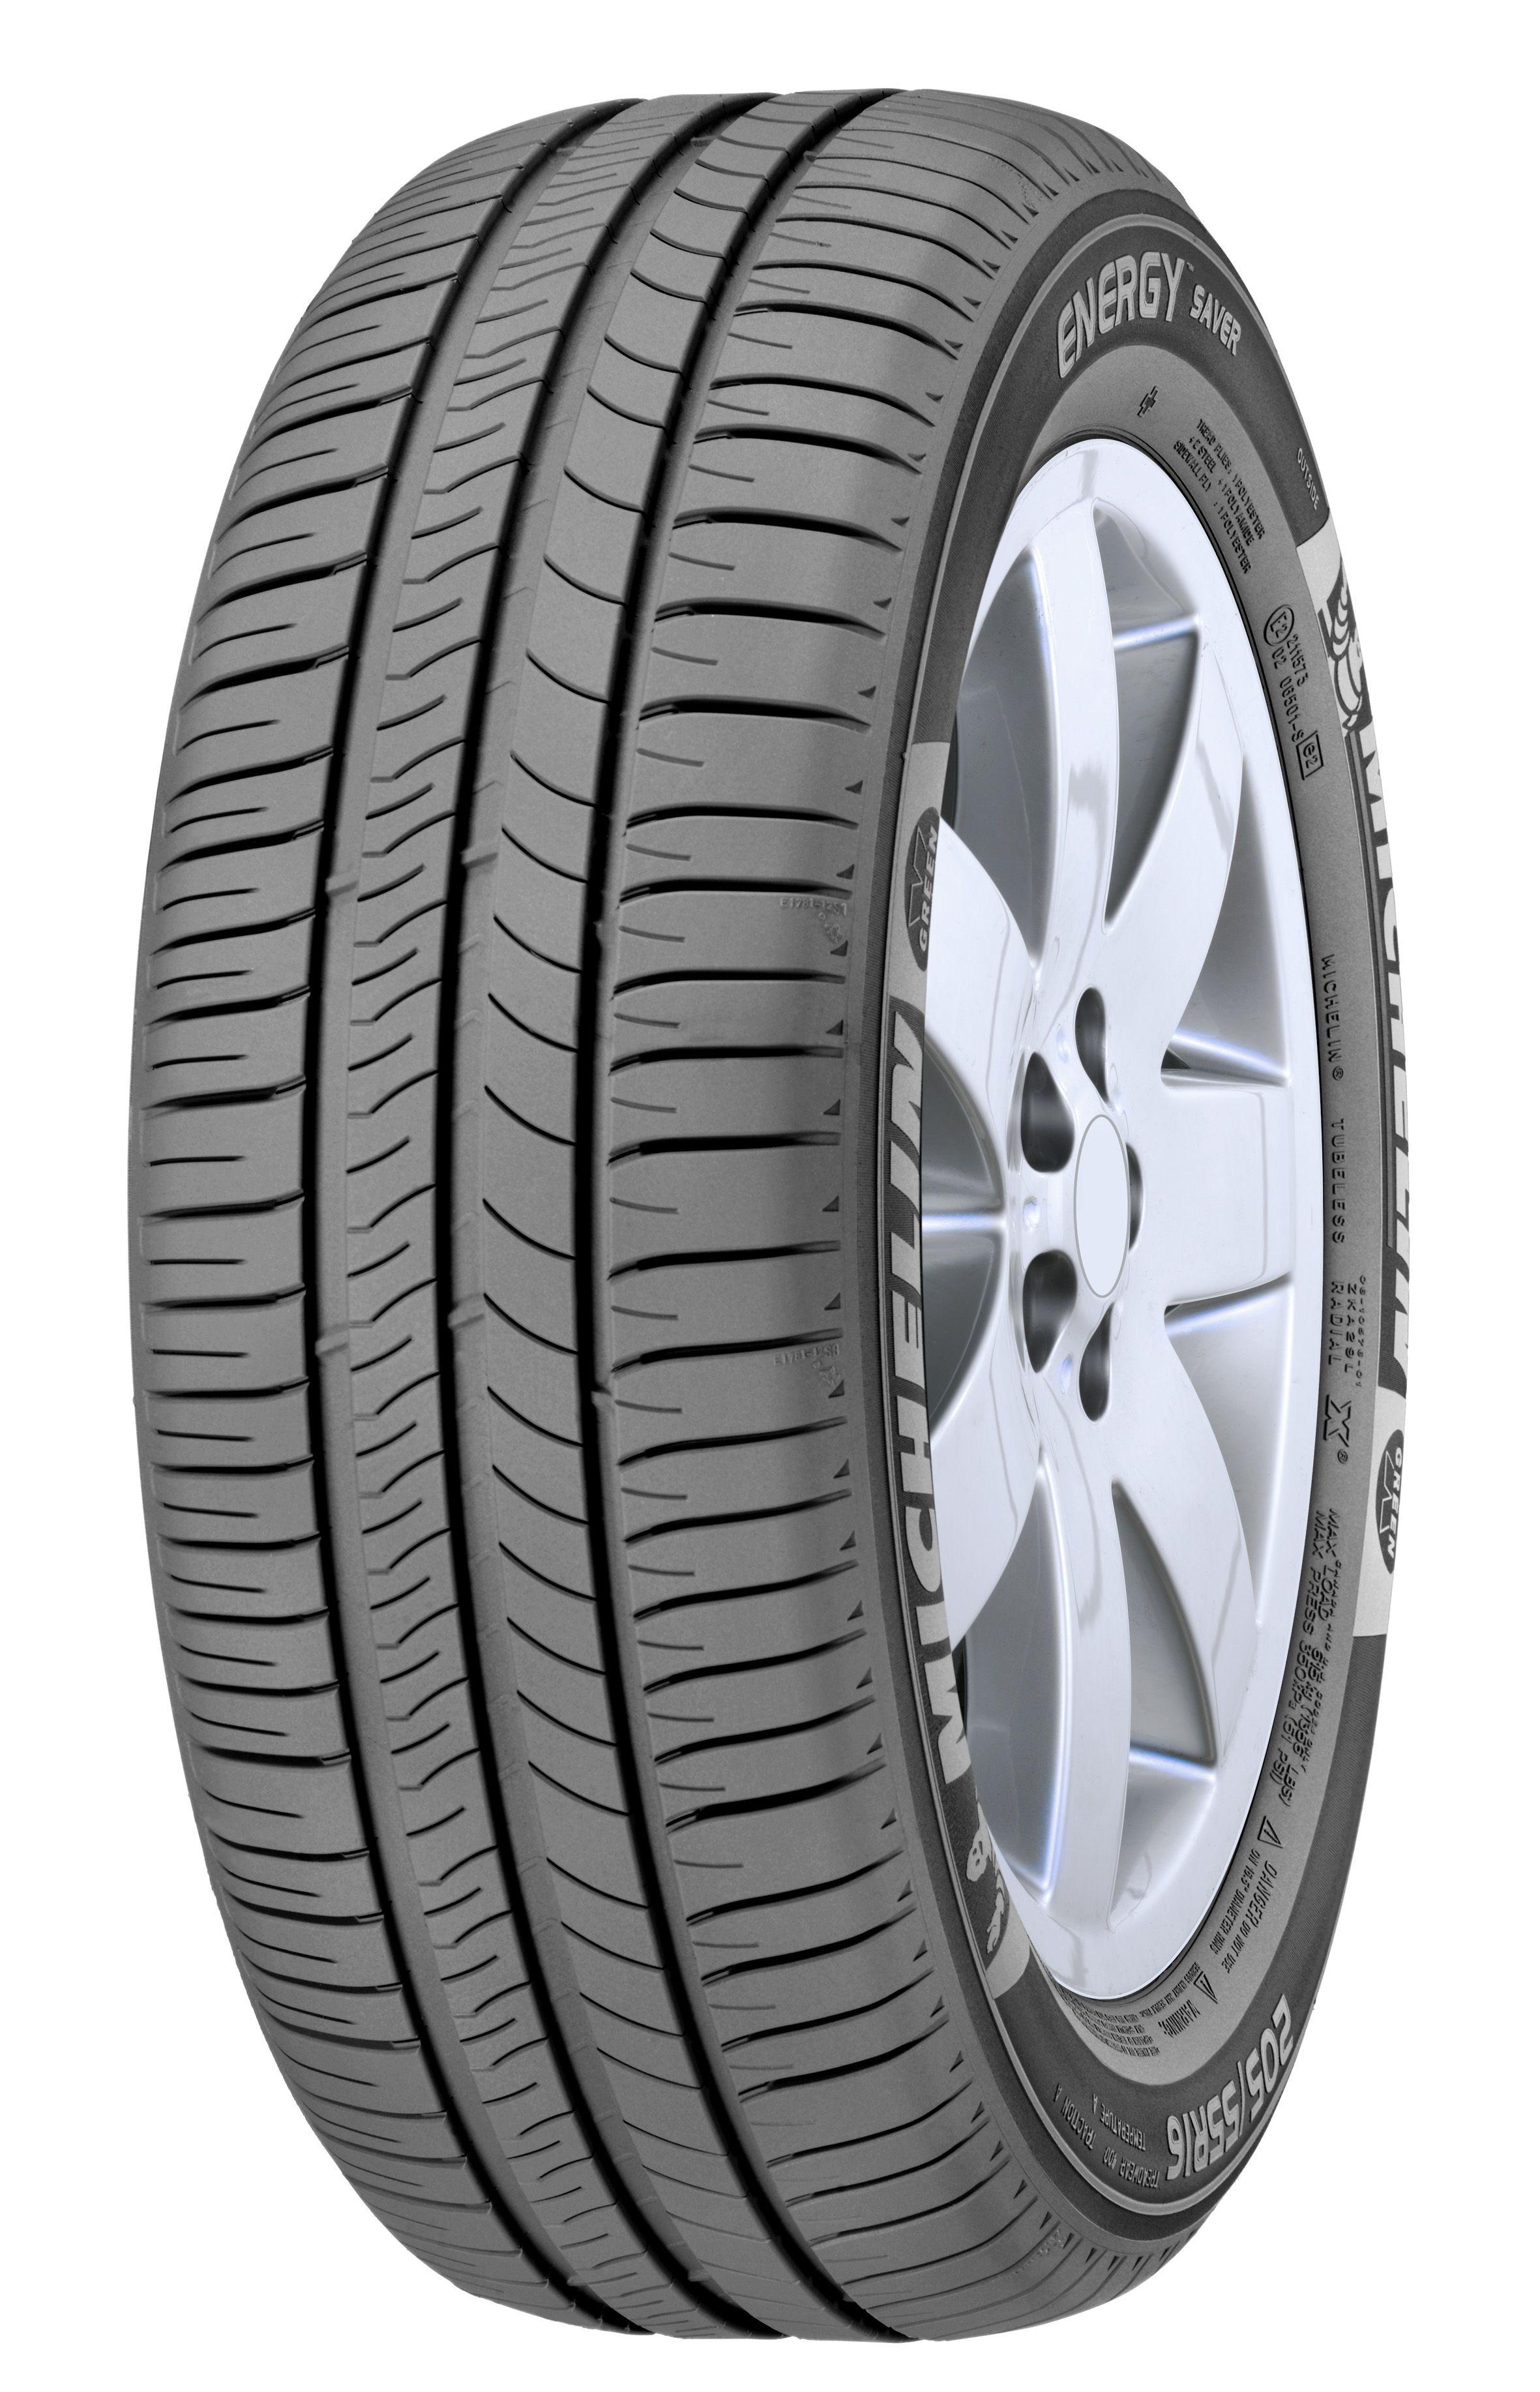 Michelin Energy Saver Plus P215/60R-16 MIC1570B